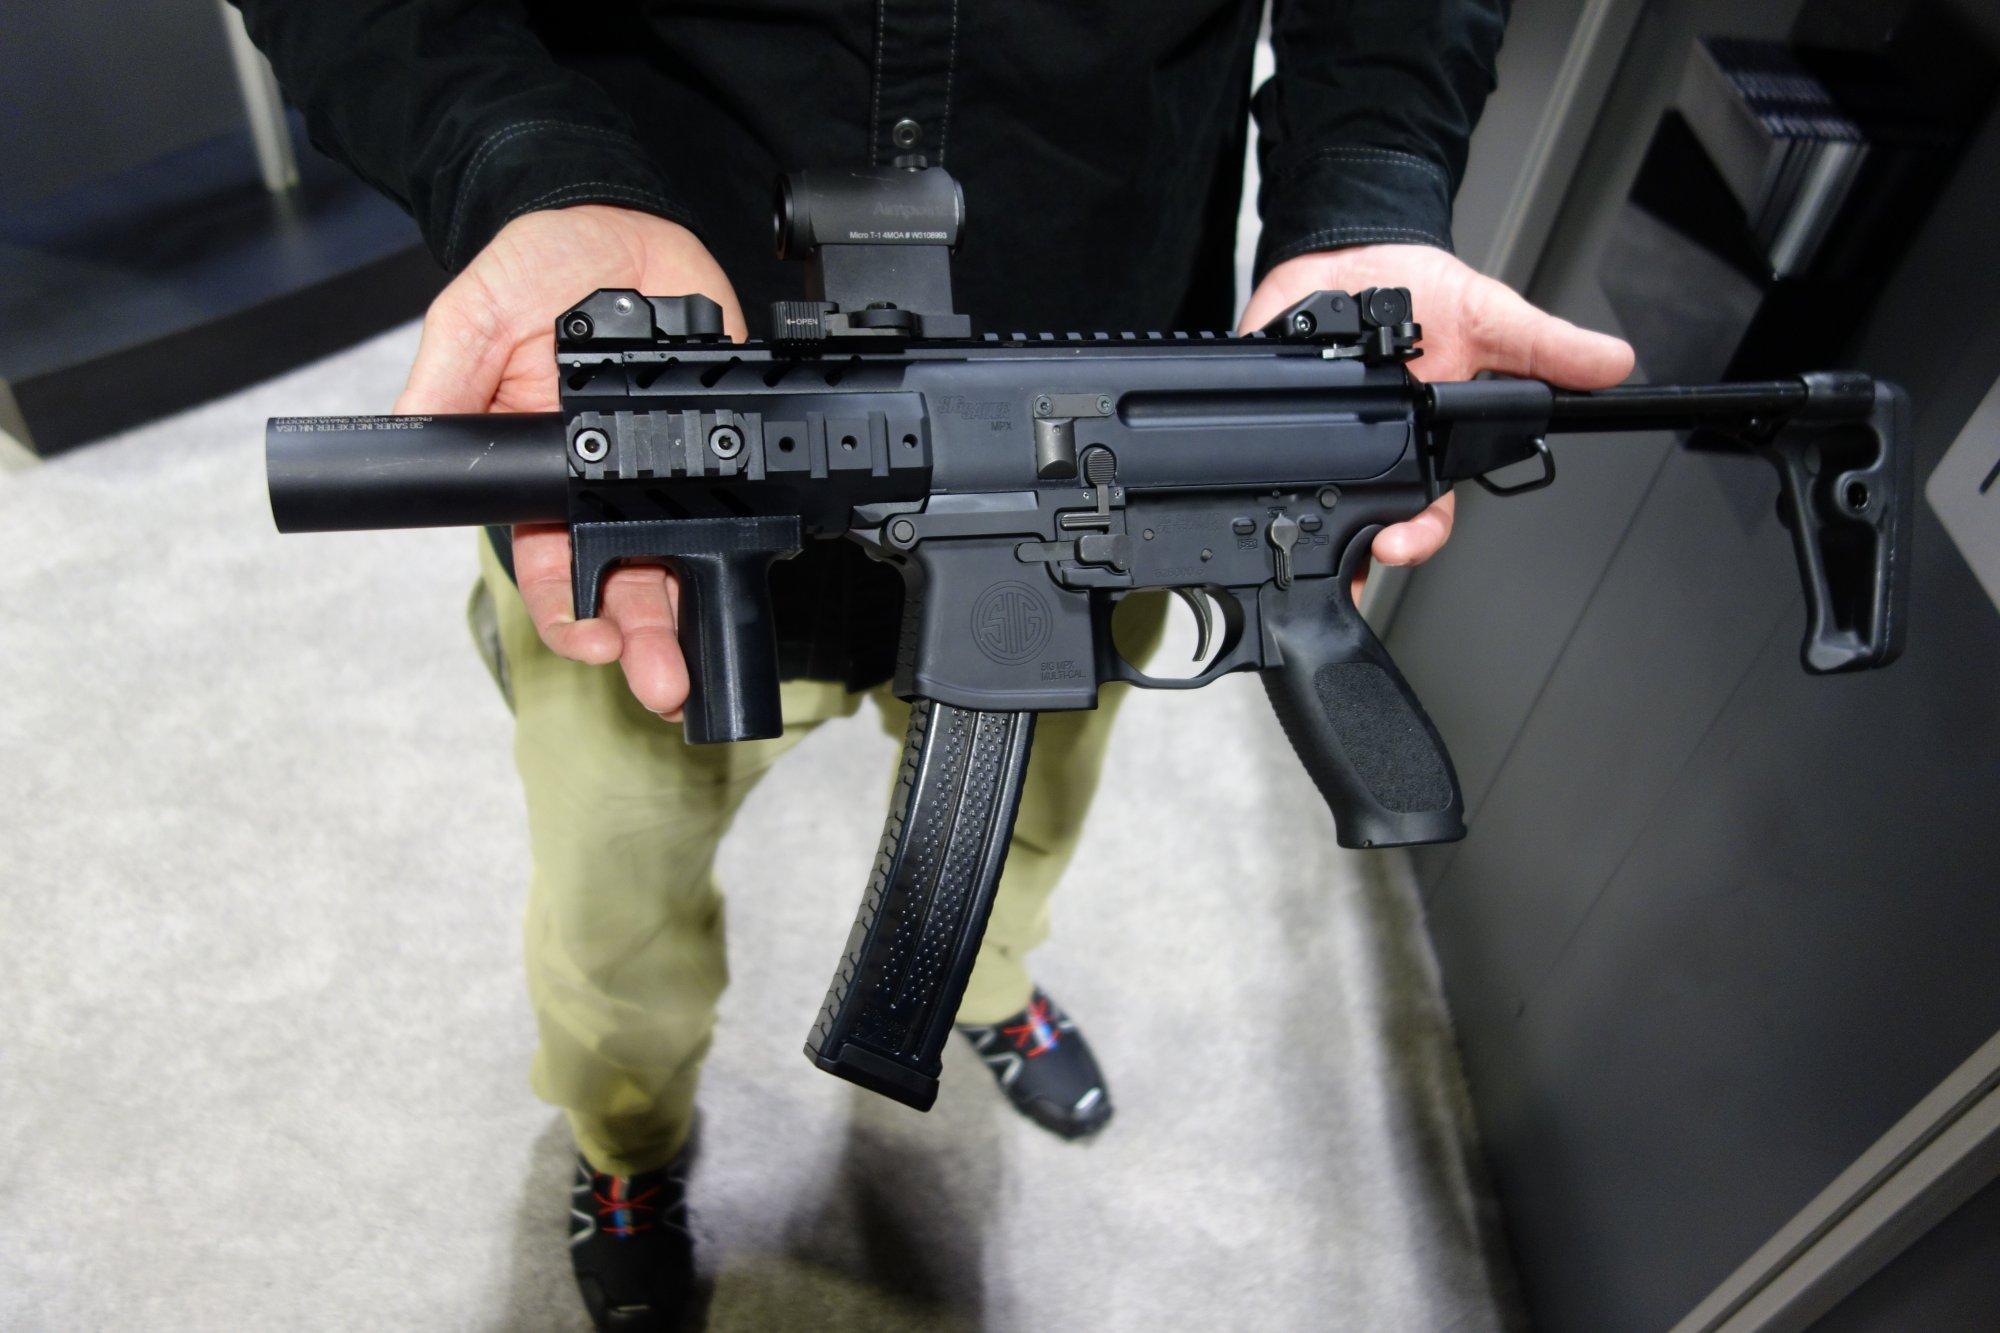 SIG SAUER MPX KeyMod Multi-Cal Machine Pistol/Mini Submachine Gun (SMG)/PDW (Personal Defense Weapon) with Silencer/Sound Suppressor at NDIA SOFIC ...